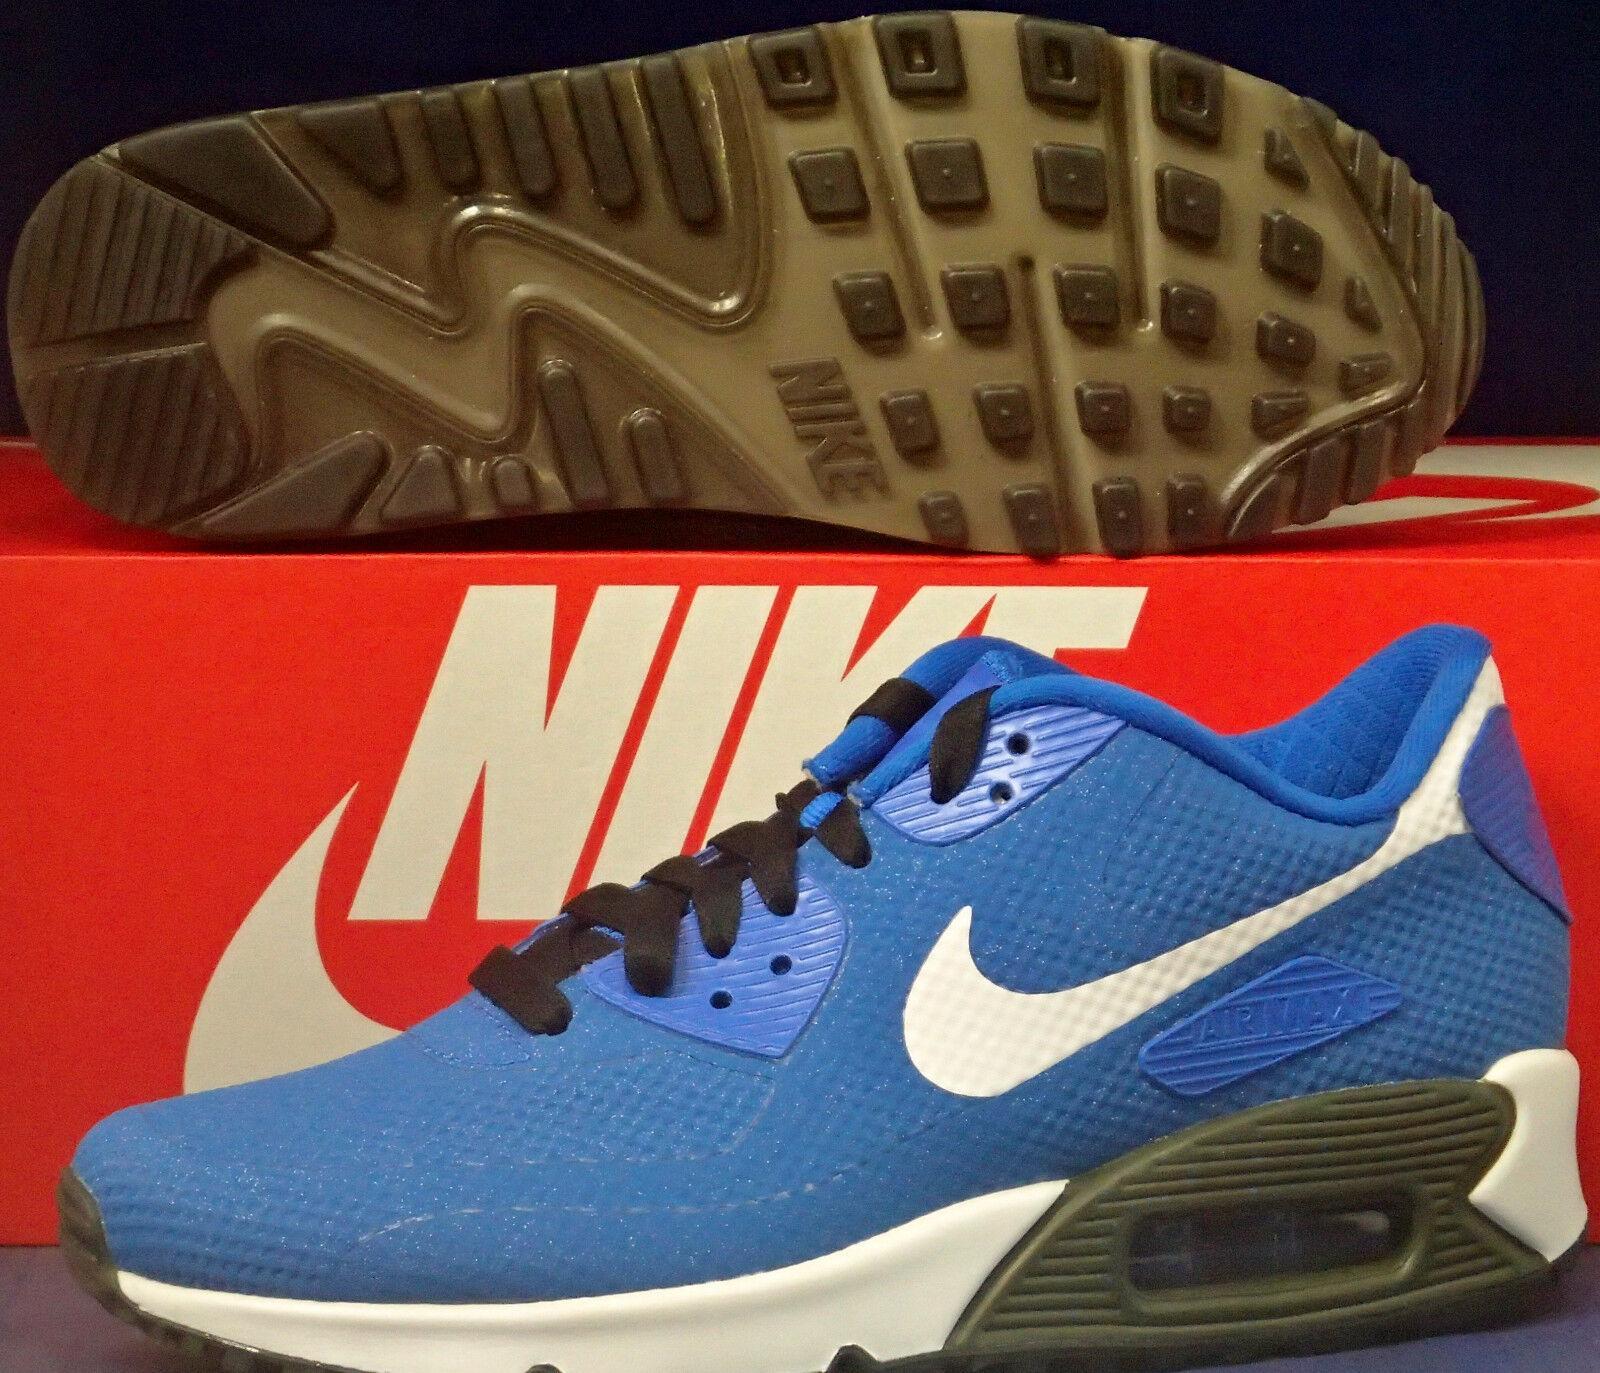 Nike Air Max 90 Hyperfuse Premium iD bluee Youth SZ 4.5Y    Womens 6 (822641-997)